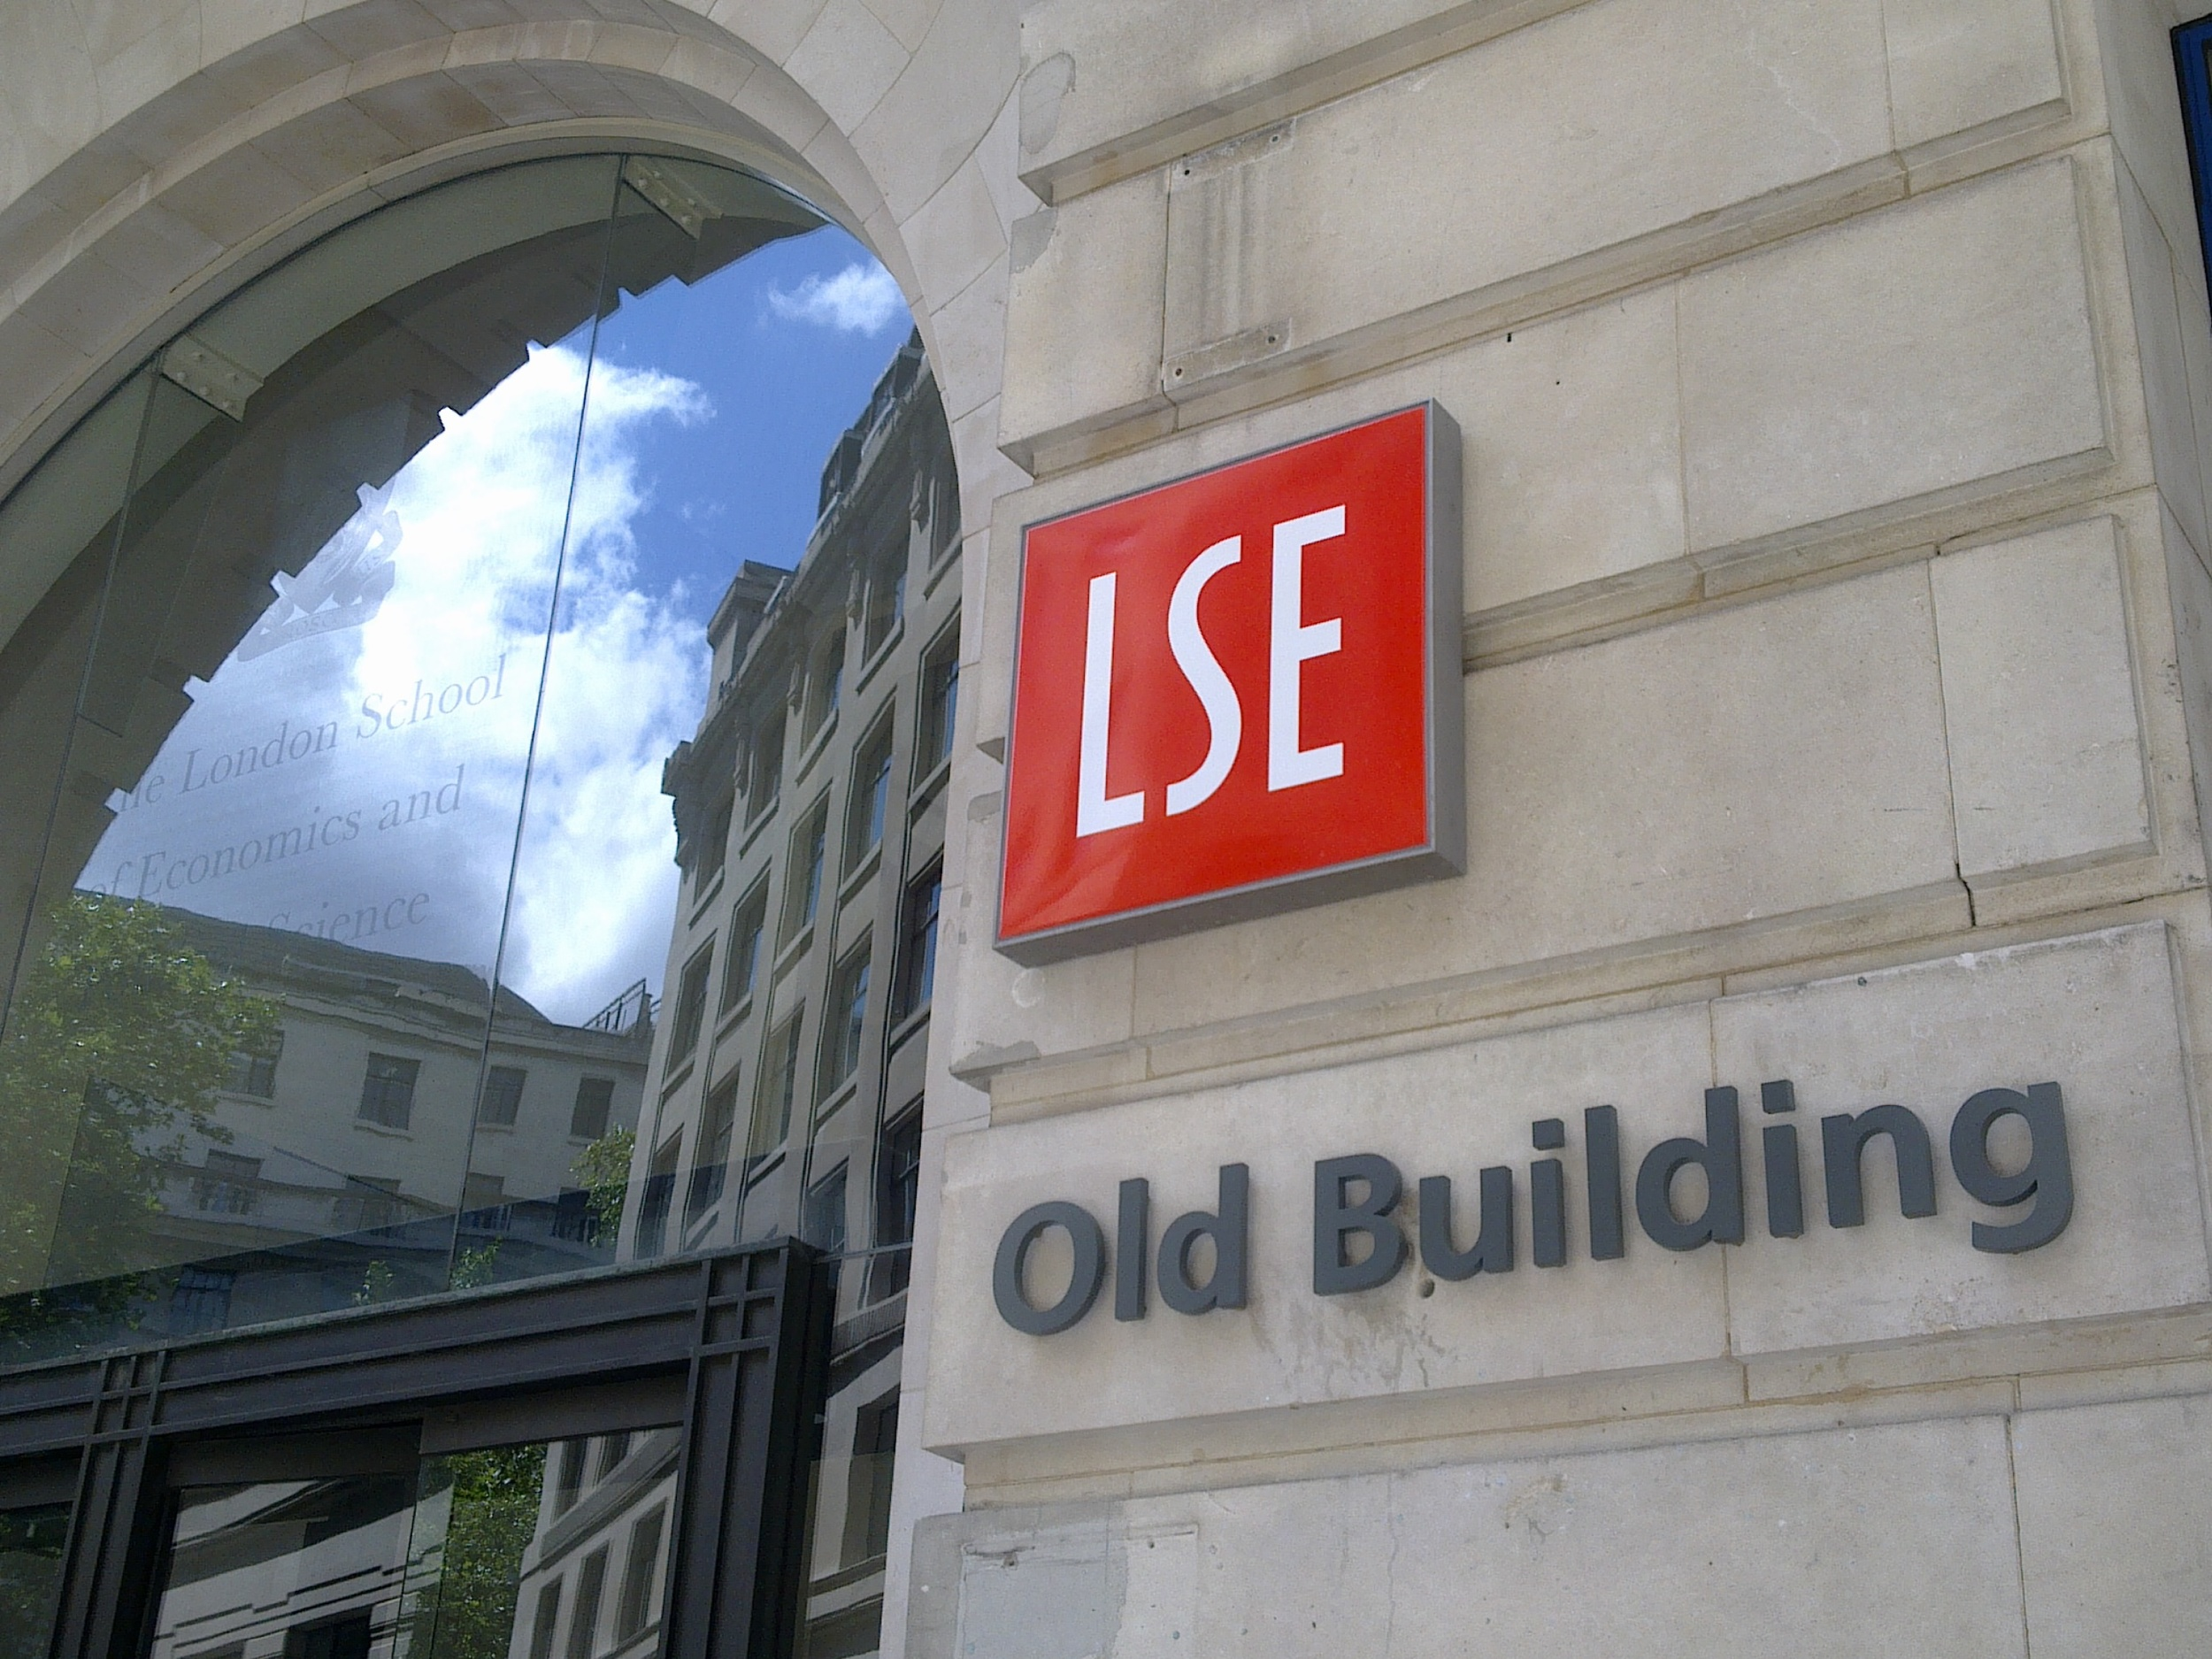 LSE-OldBuilding